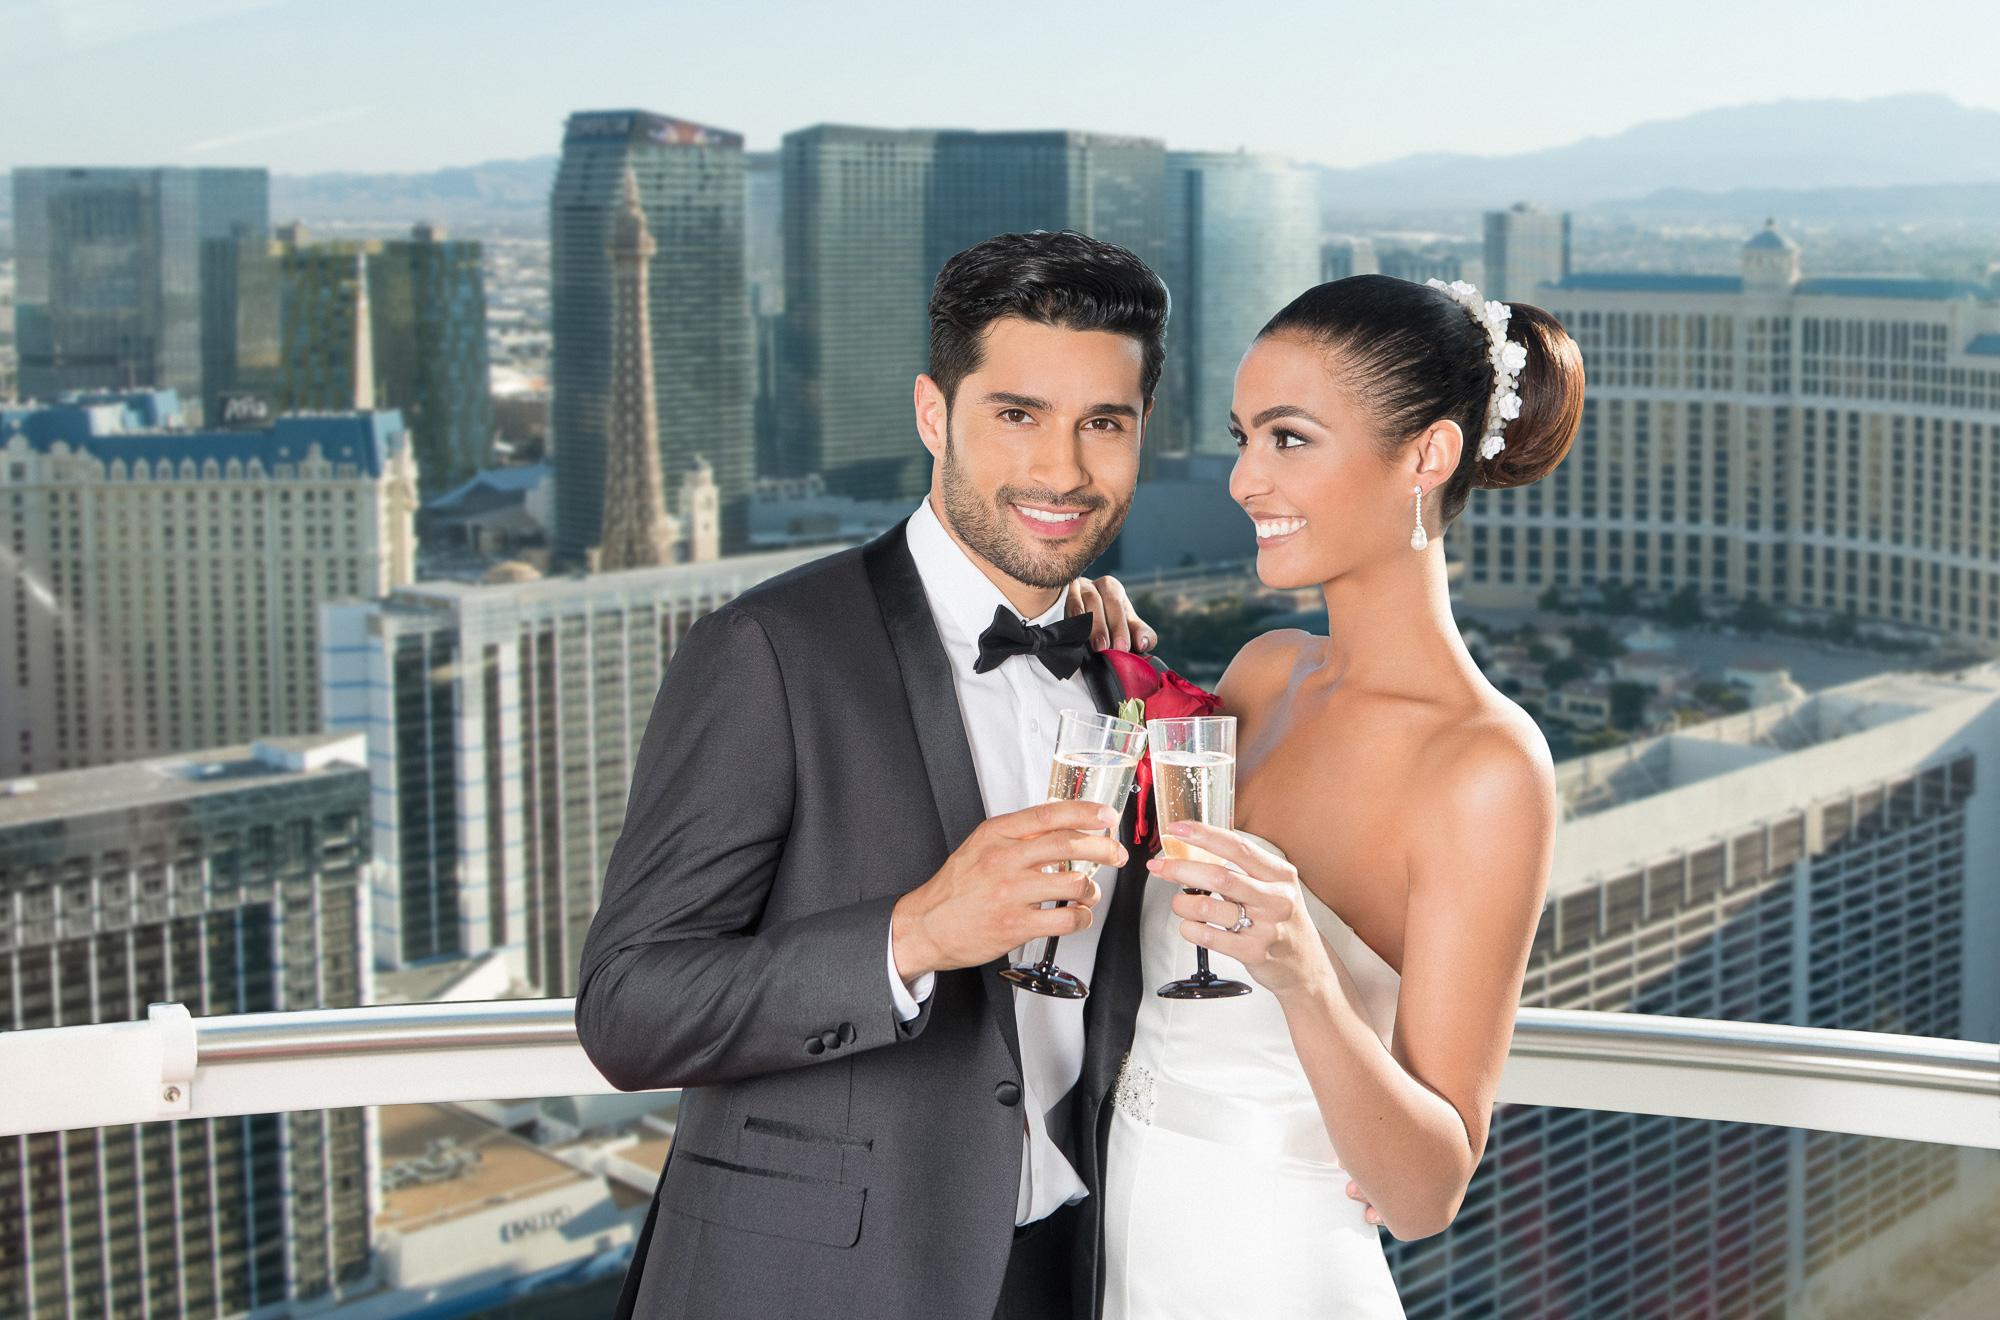 Wedding Hair and Makeup in Las Vegas